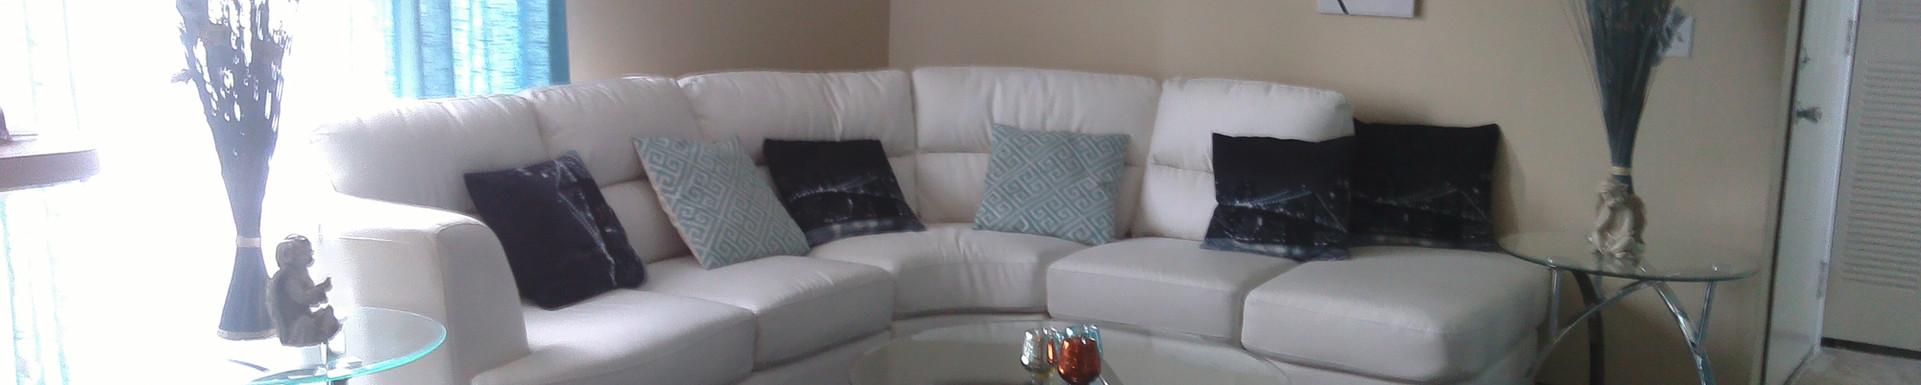 Interior Living Room Photo